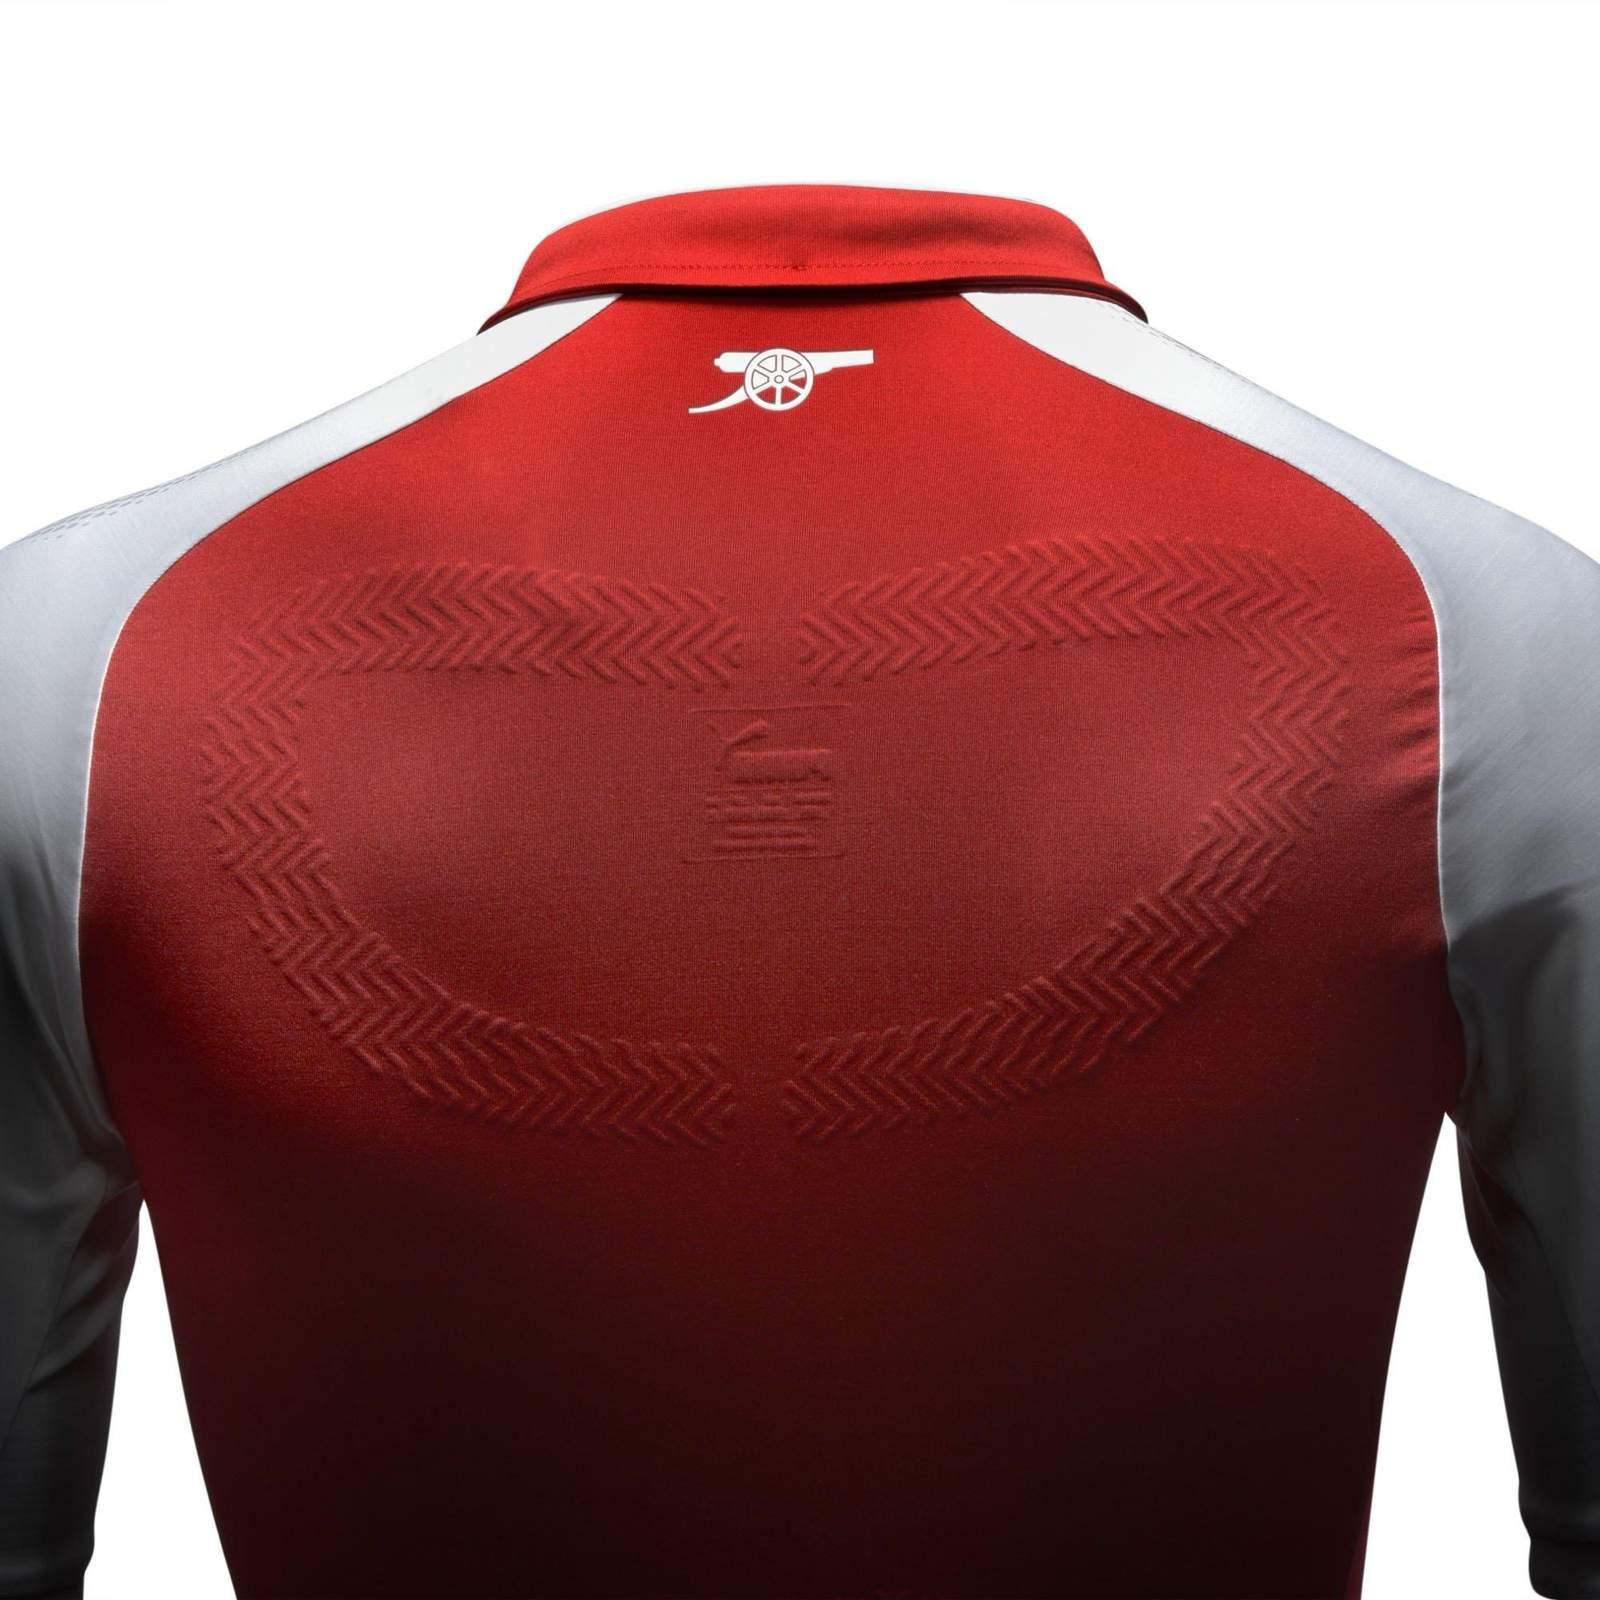 arsenal-17-18-home-shirt-back-shoulders